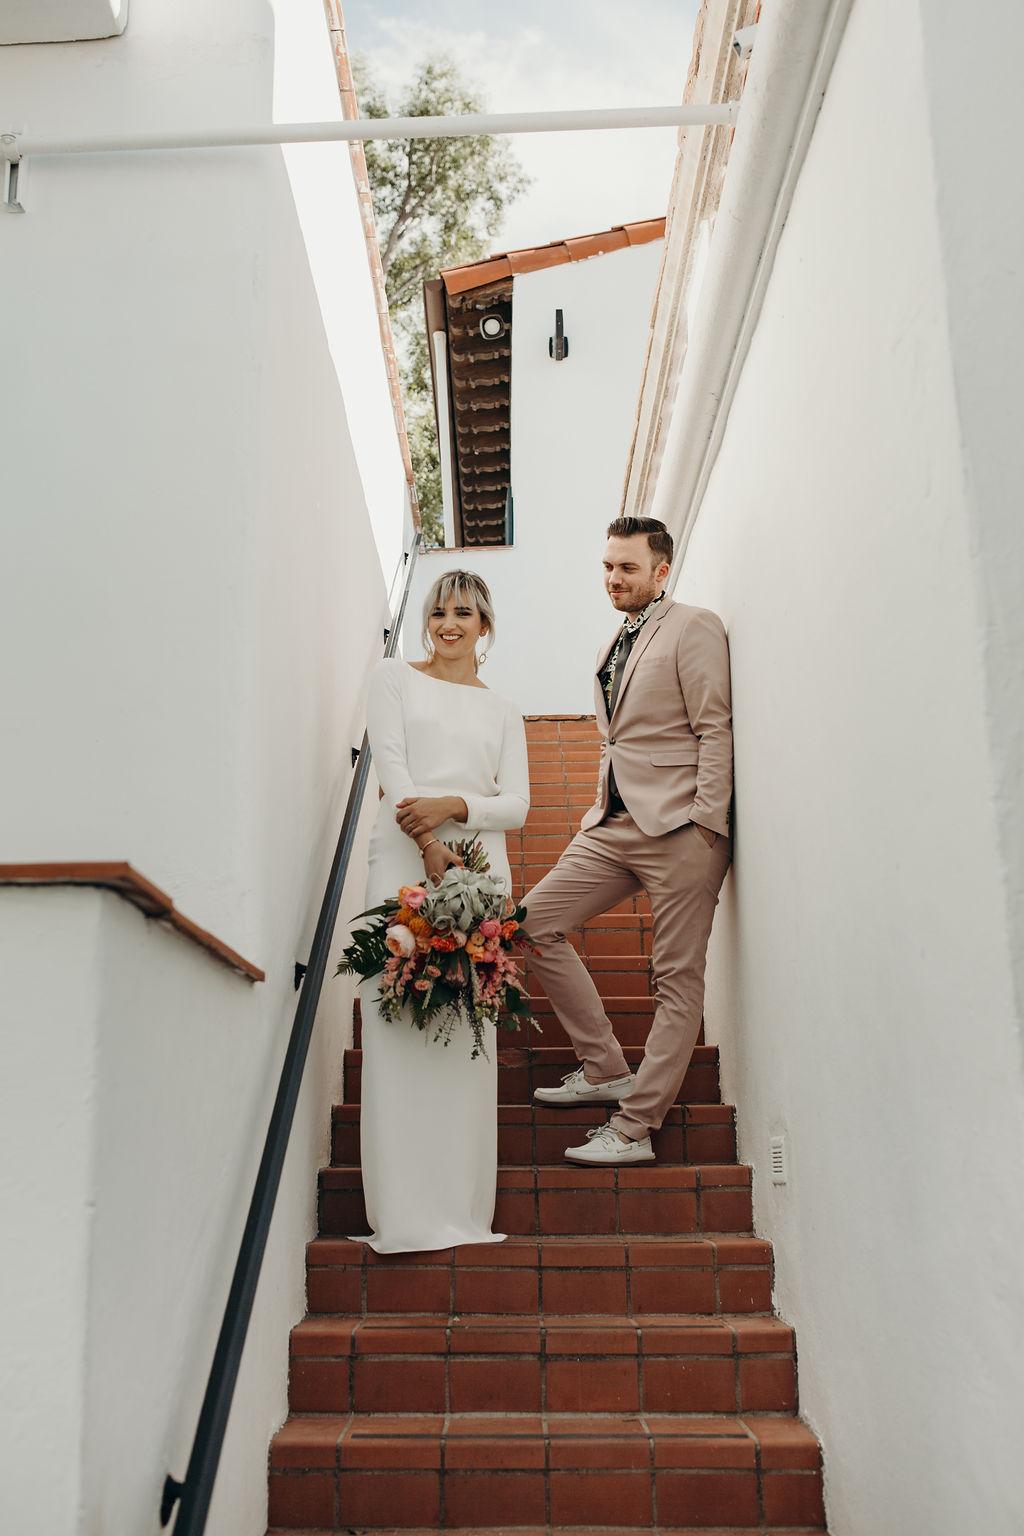 love-fern-design-studio-custom-wedding-invitations-for-the-modern-couple-modern-calligraphy-in-seattle-washington-custom-wedding-stationery-neon-acrylic-eclectic-alice-wonderland-wedding-wrigley-mansion